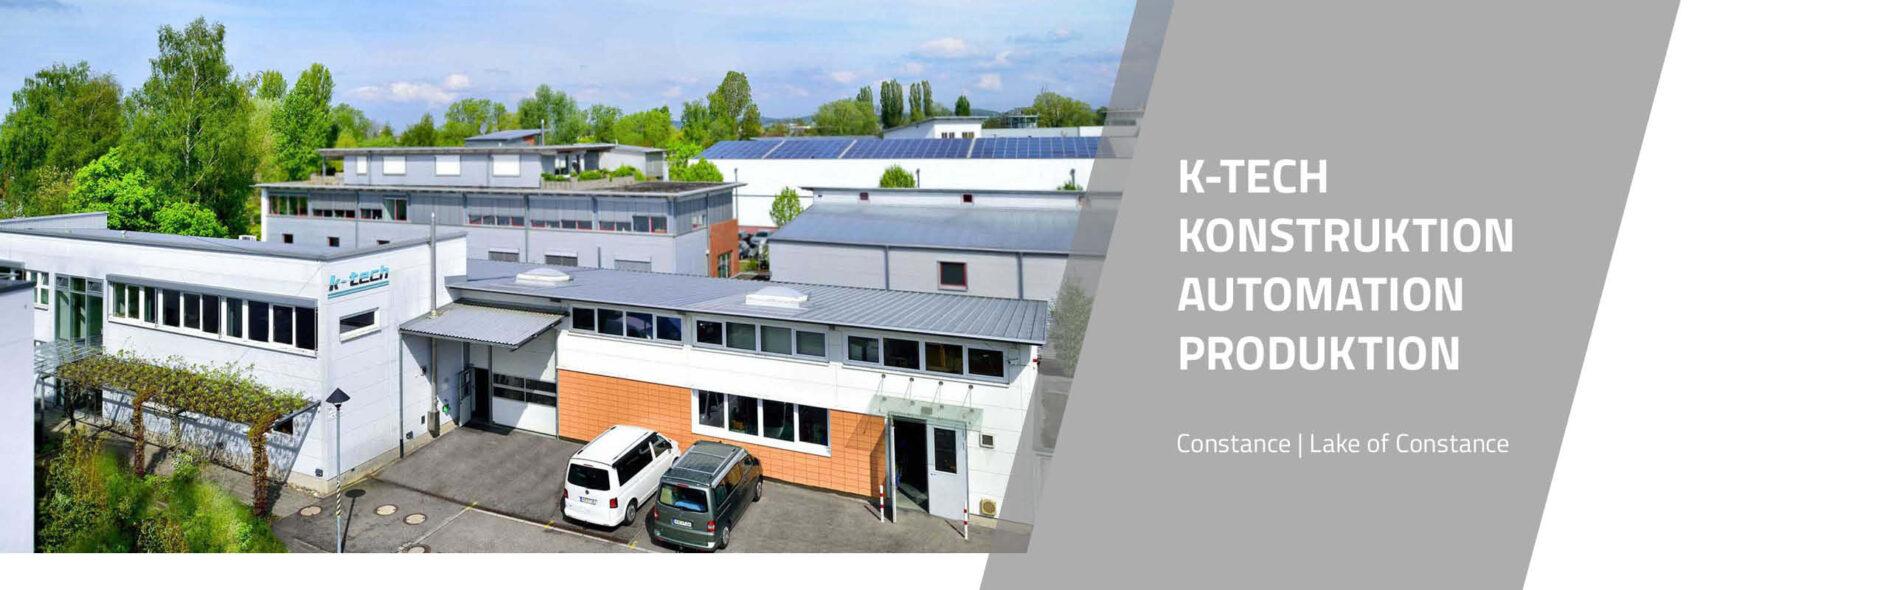 k-tech Sondermaschinenbau Konstanz Bodensee